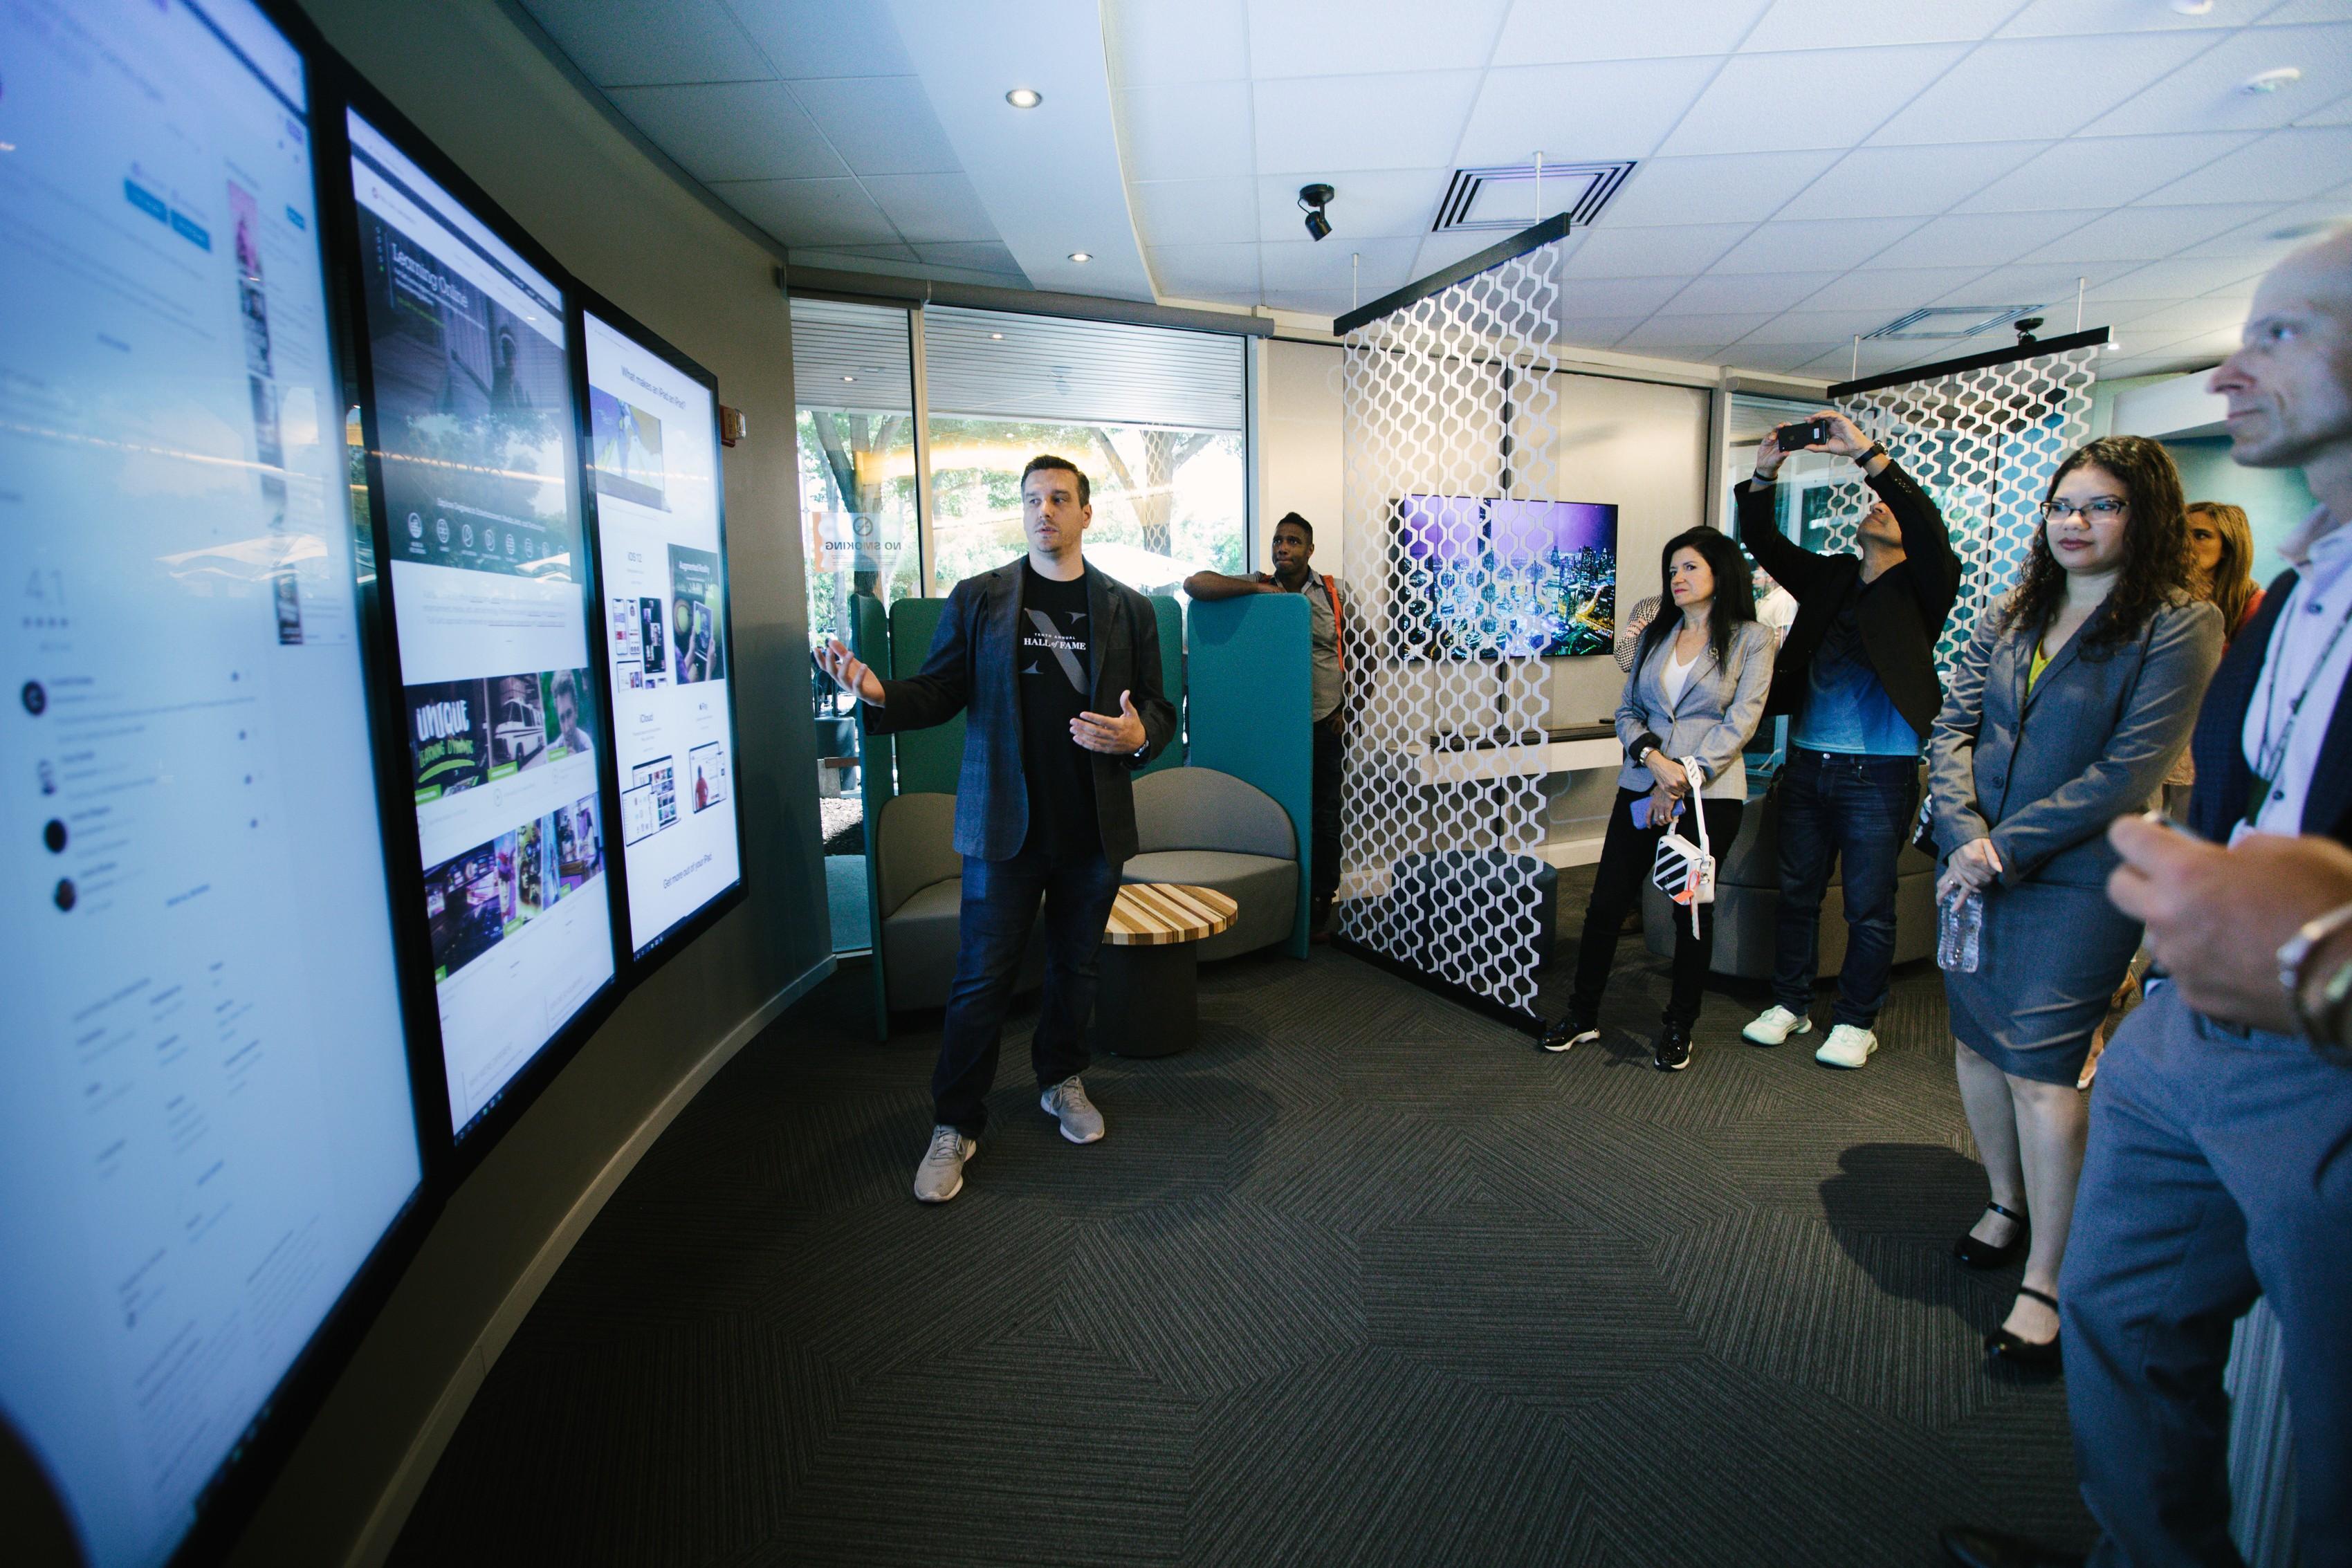 Winter Park's Full Sail University opens smart technology